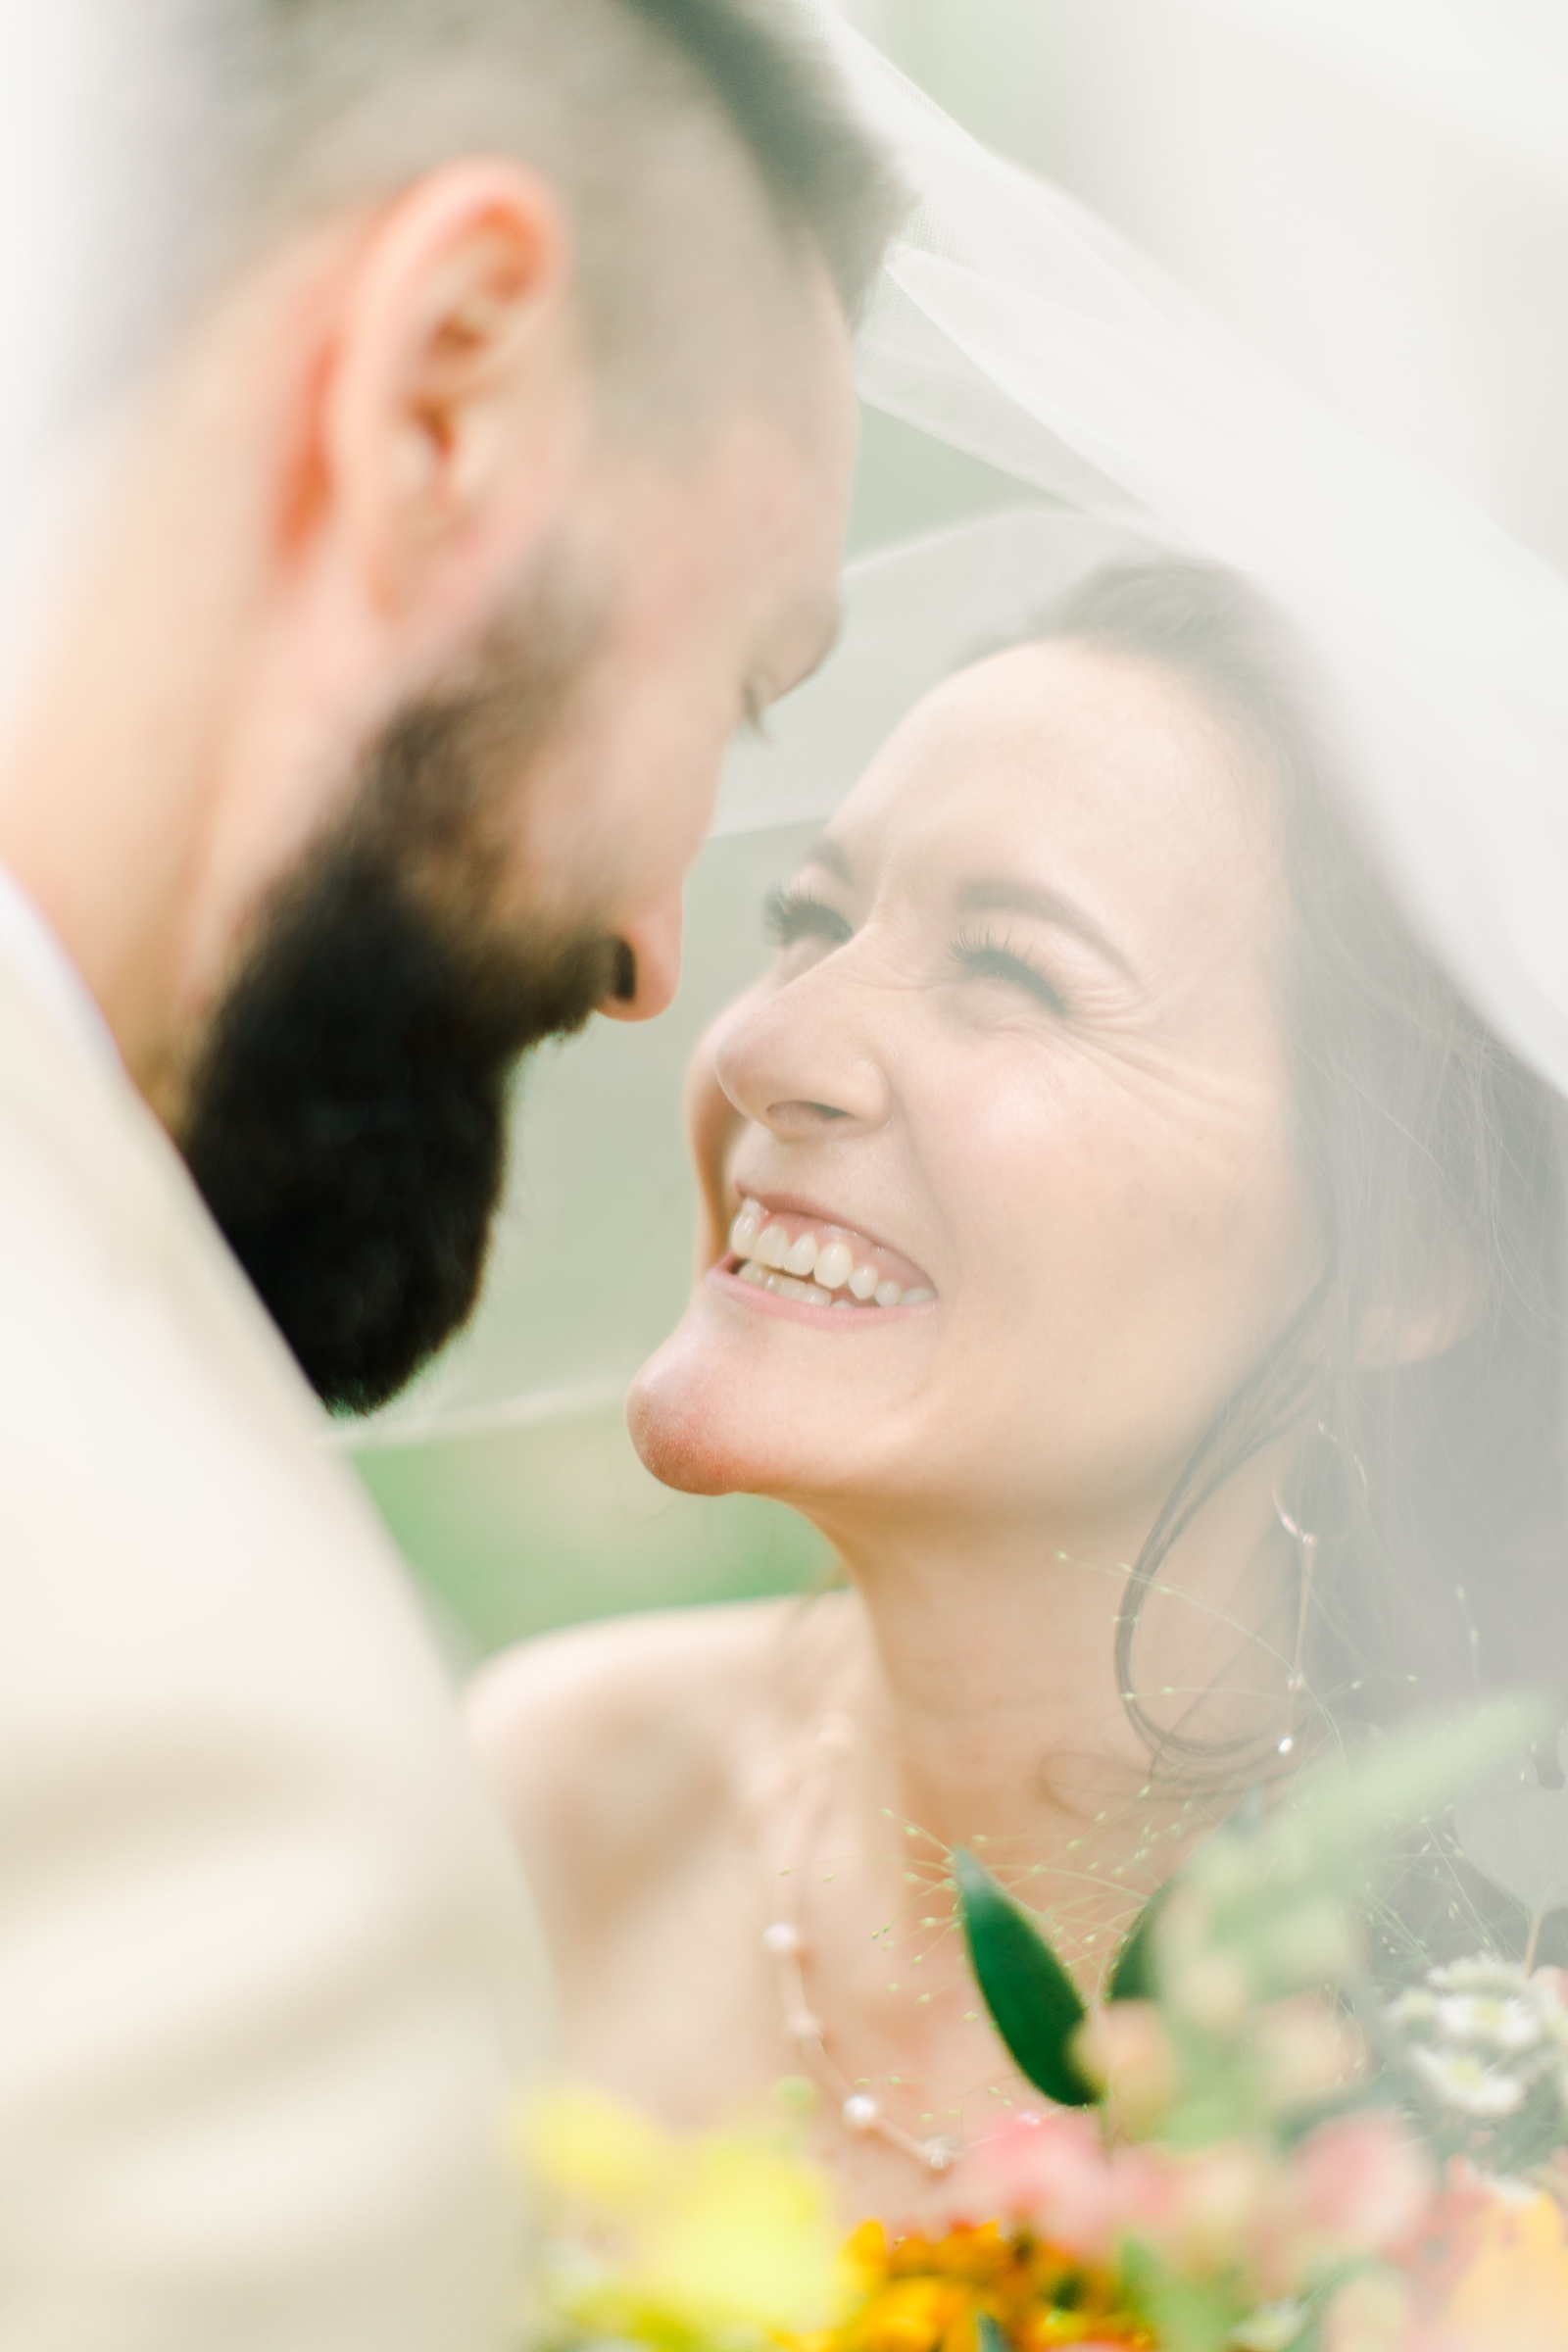 Millcreek Inn Summer Wedding, Utah wedding photography Millcreek Canyon, Salt Lake City, bride and groom under long veil